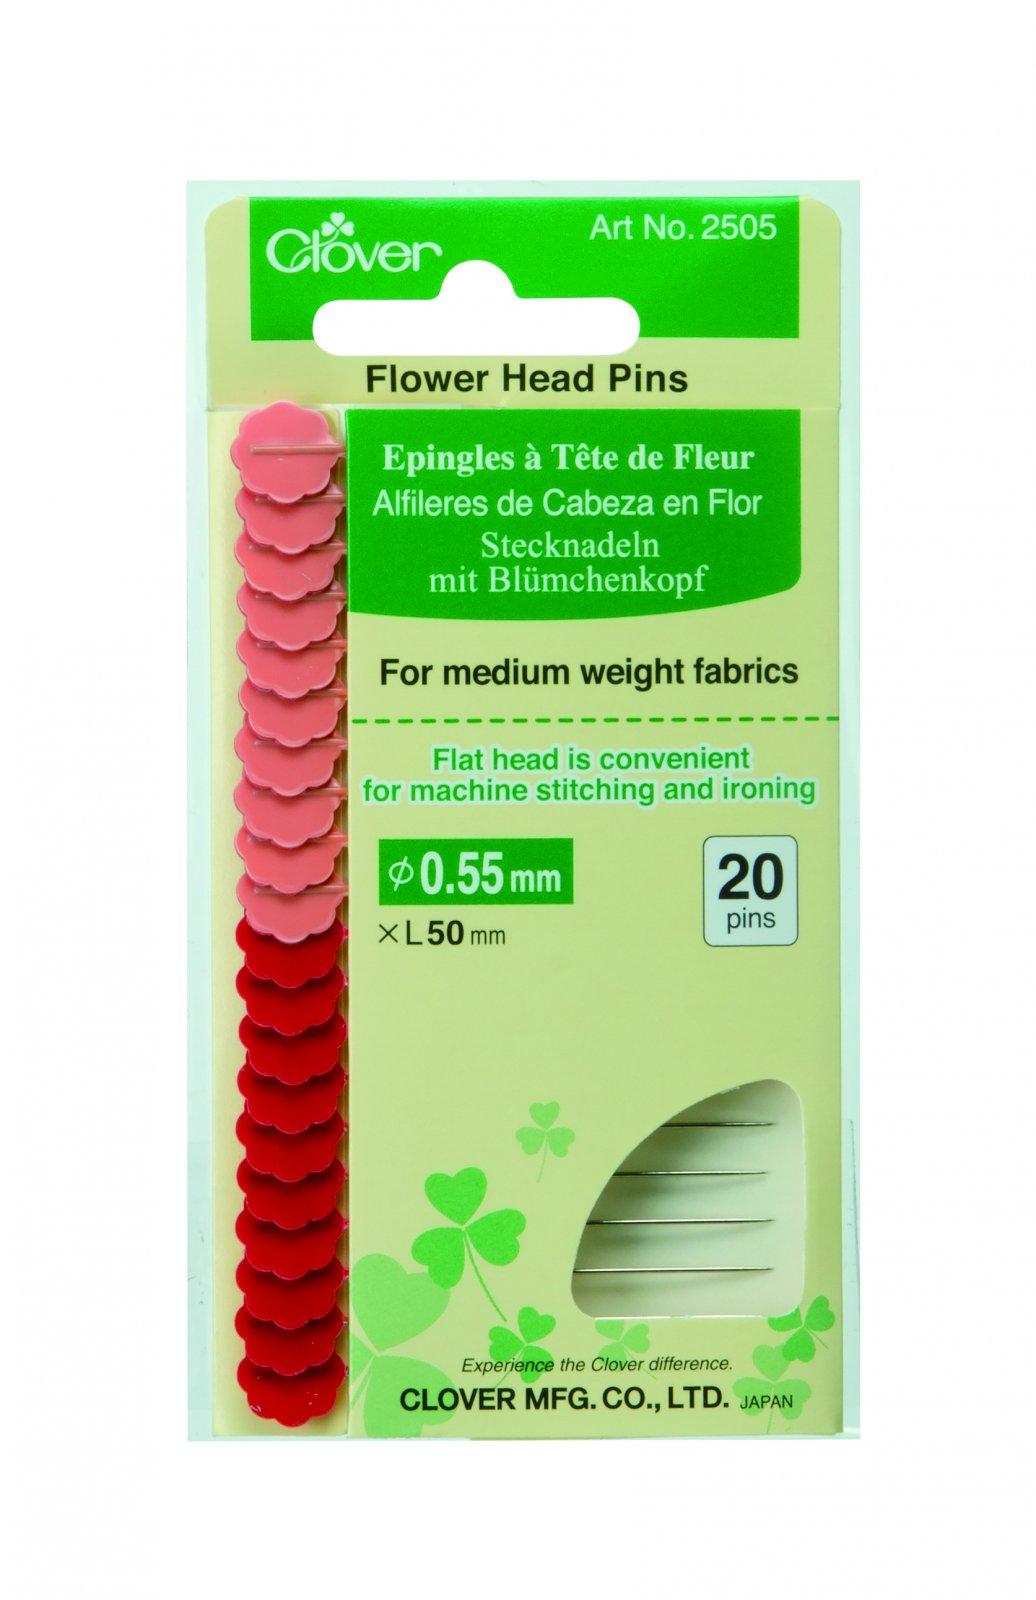 Clover - 2505 Flower Head Pins (Carded)